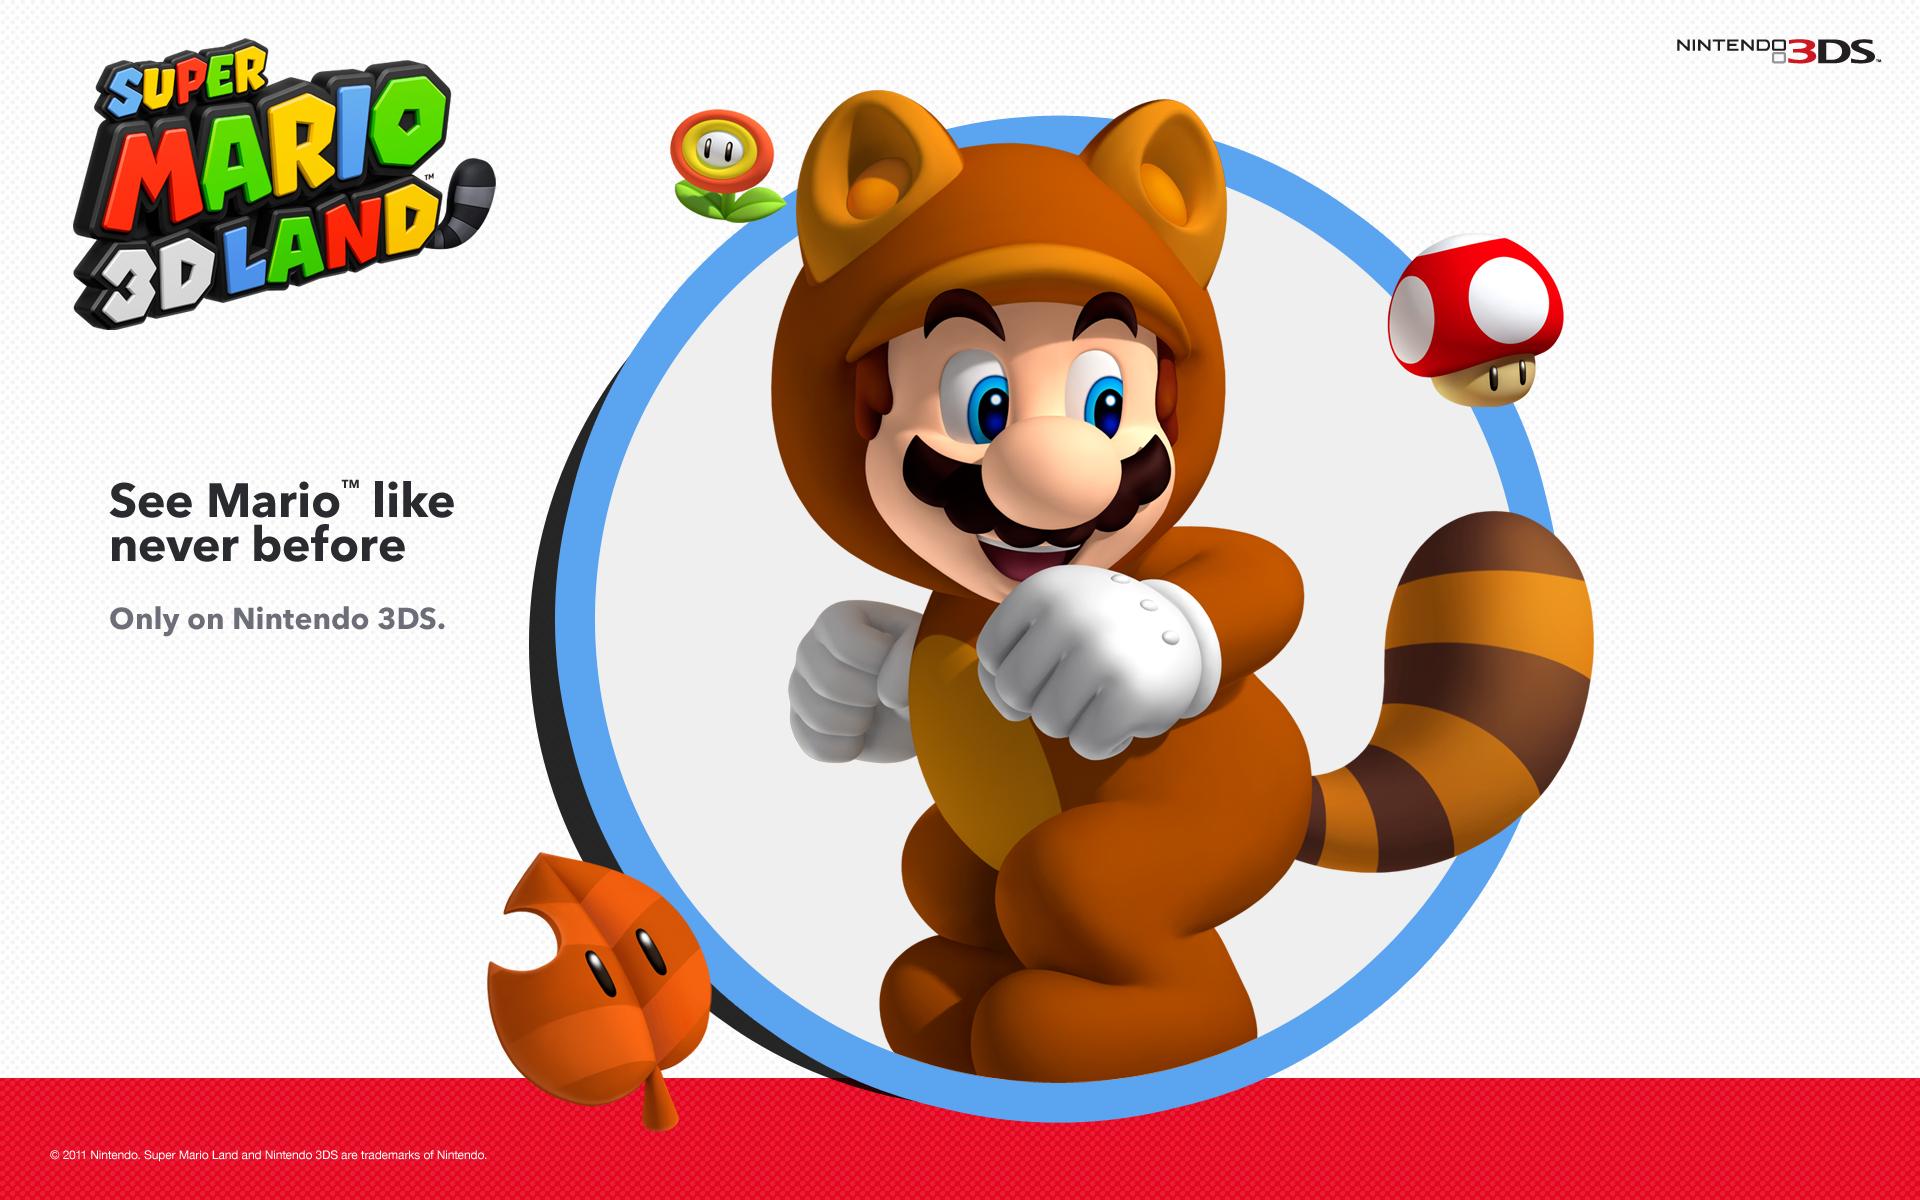 Super Mario 3d Land Wallpaper Added Pure Nintendo